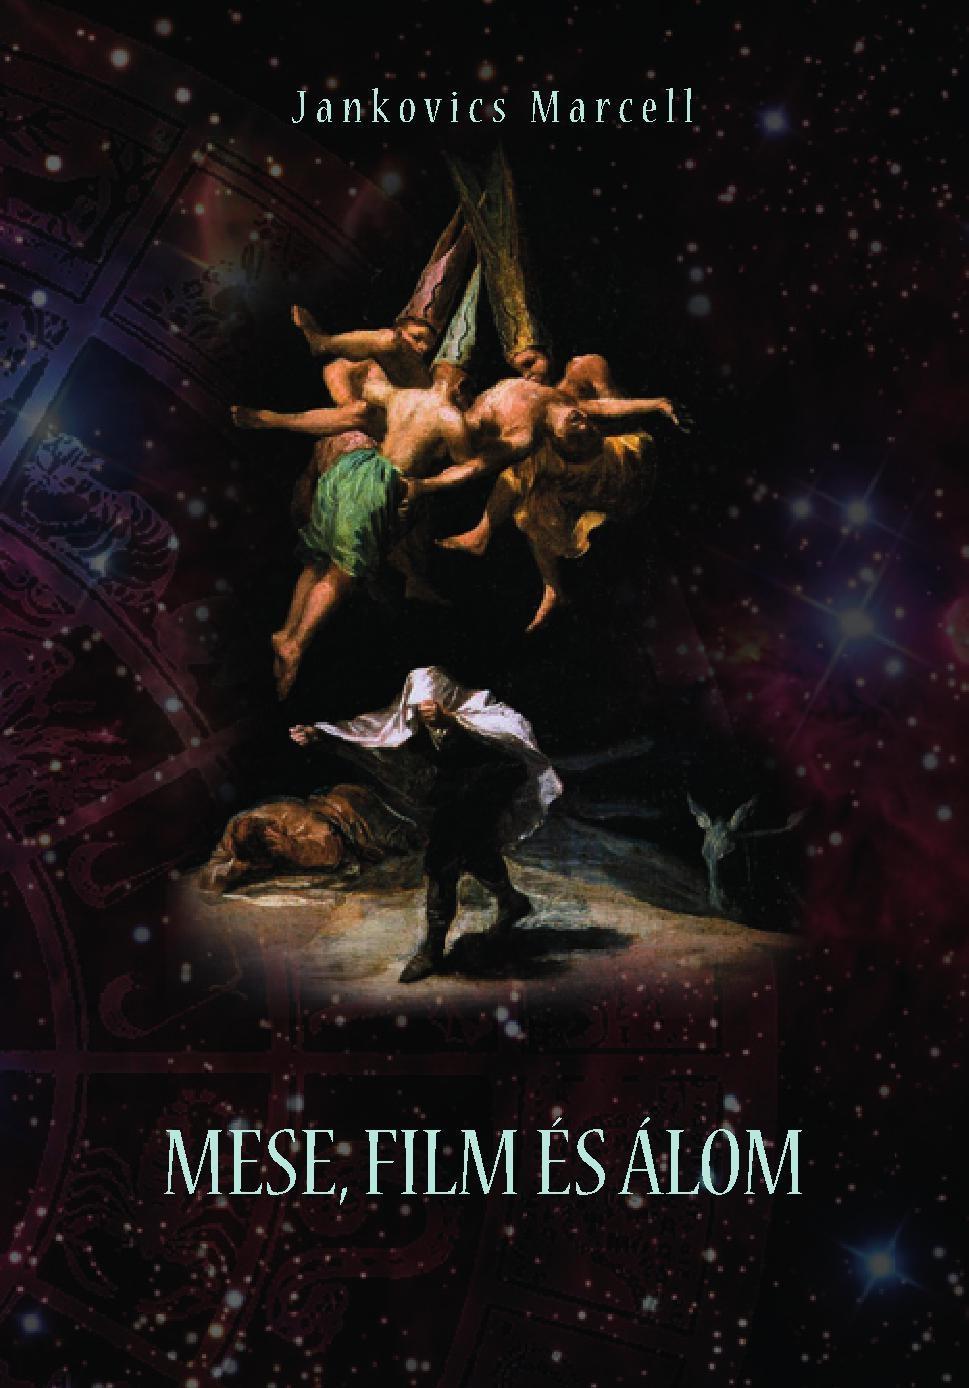 JANKOVICS MARCELL - MESE, FILM ÉS ÁLOM I-II.